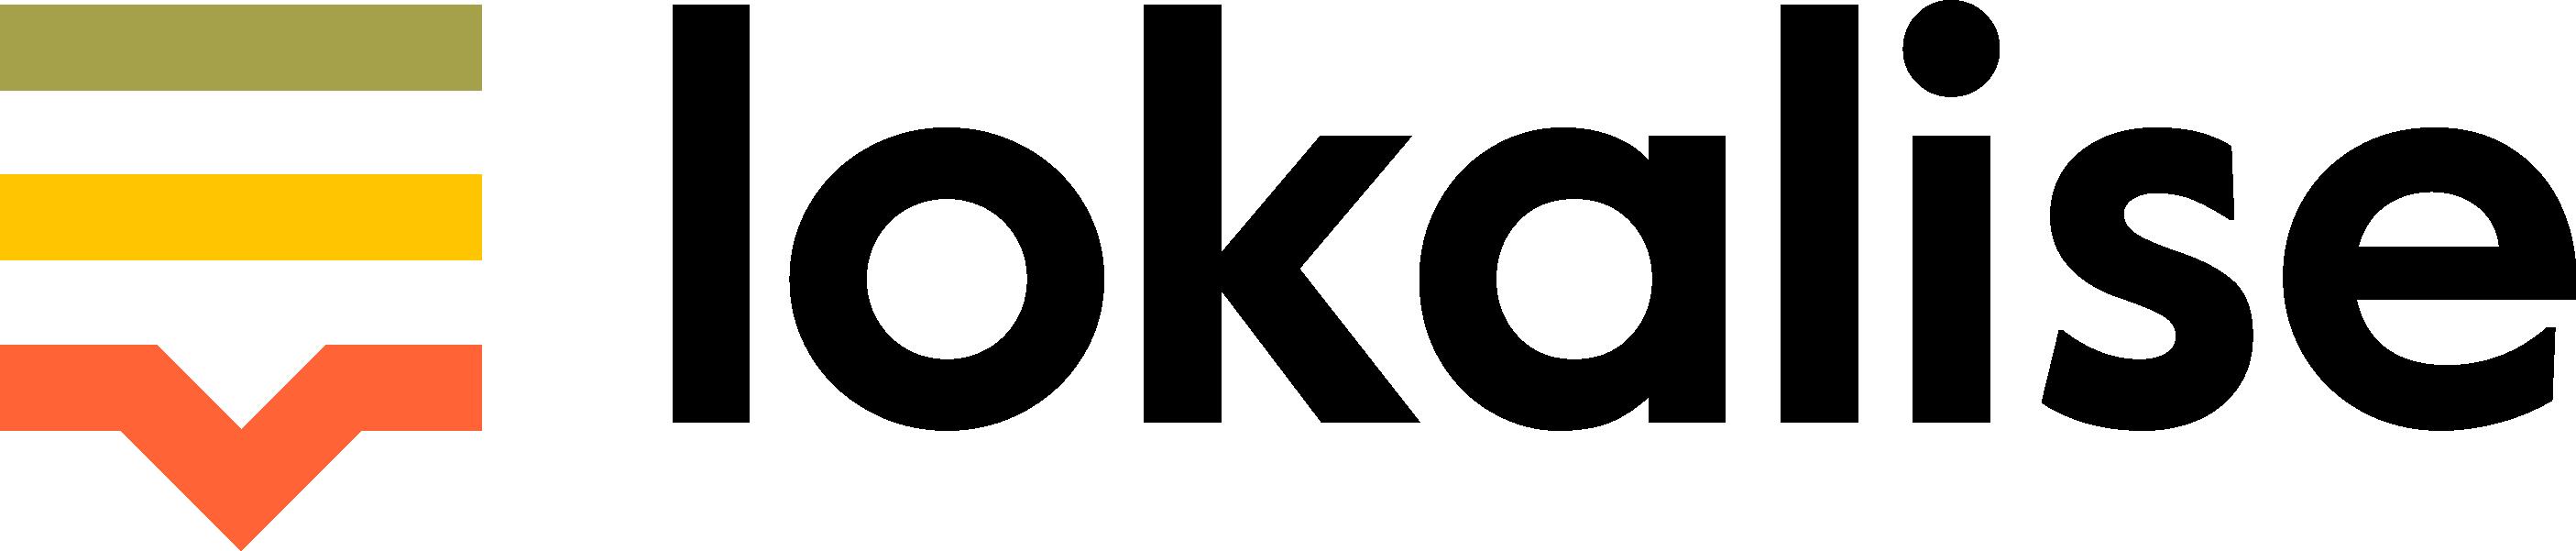 Lokalise logo